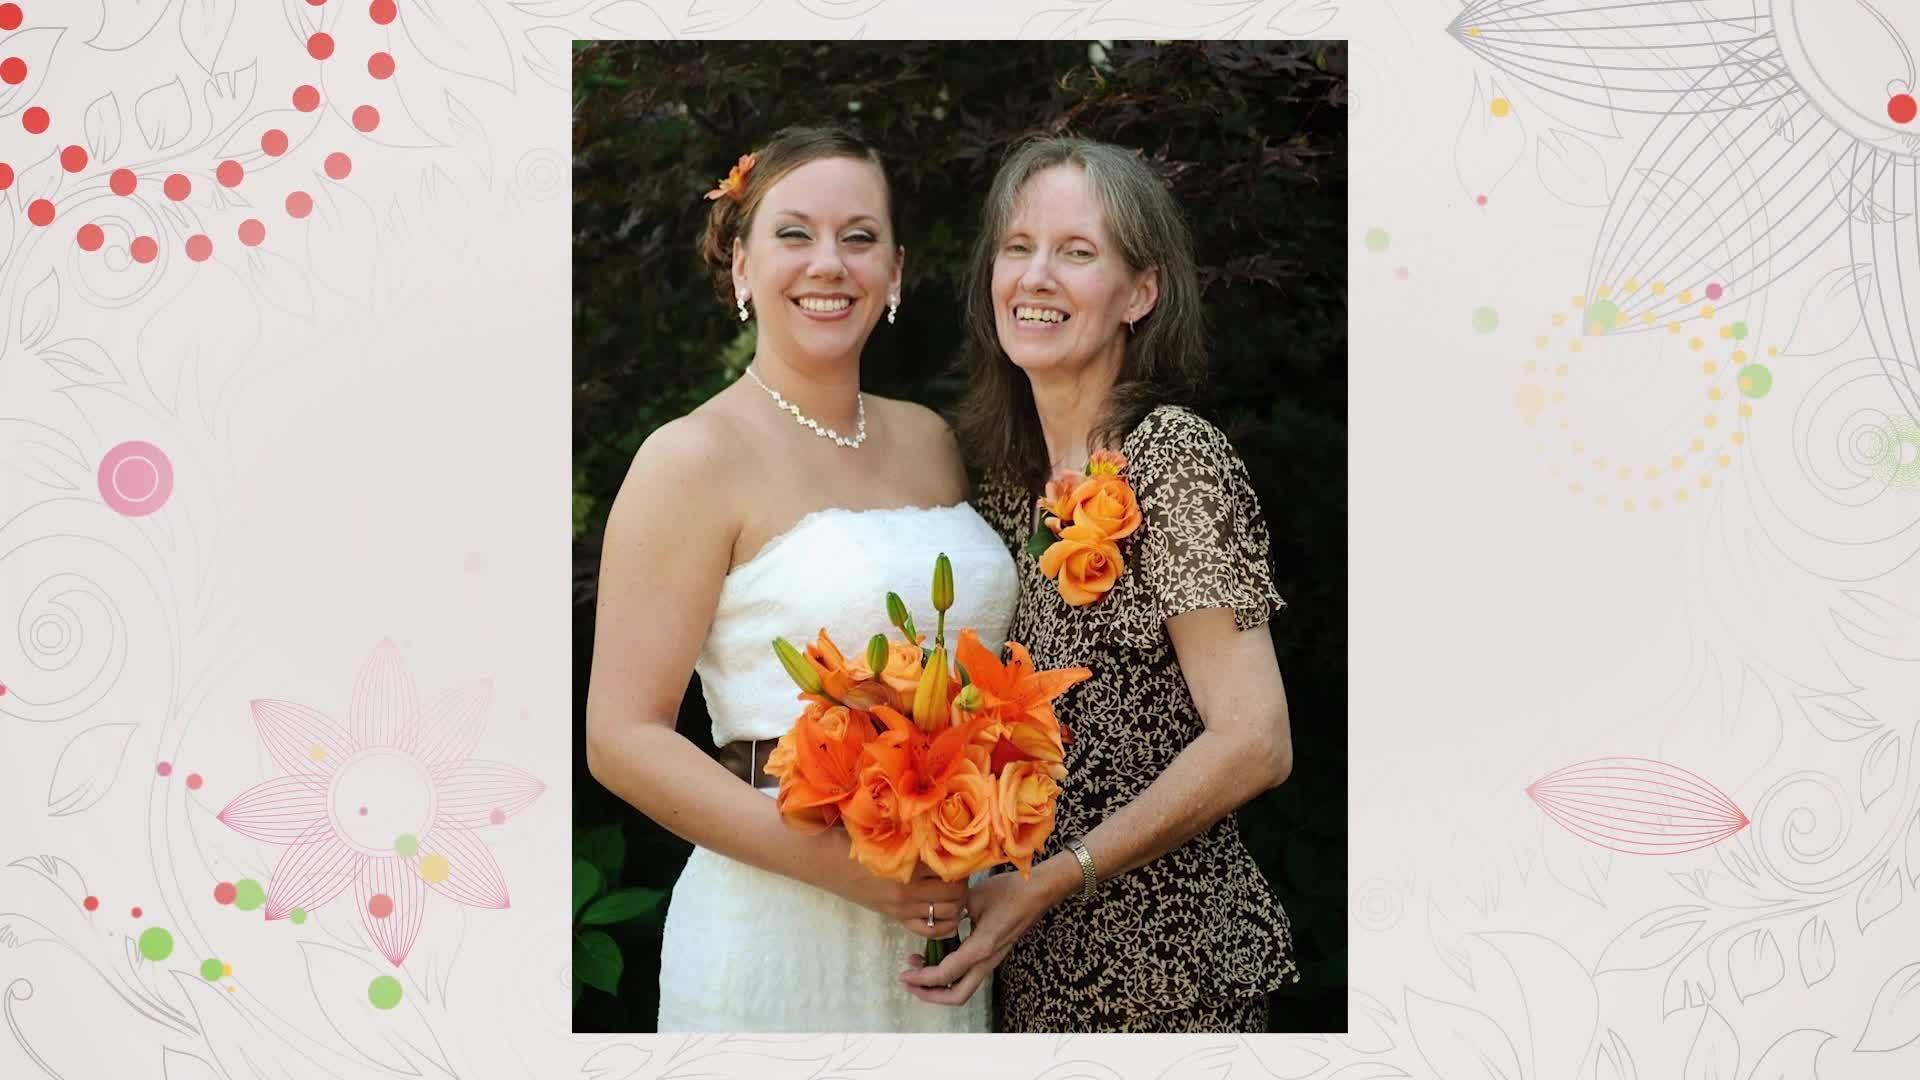 Mother_s_Day_Moment_2019__Mary_Ignasiak__3_20190506172145